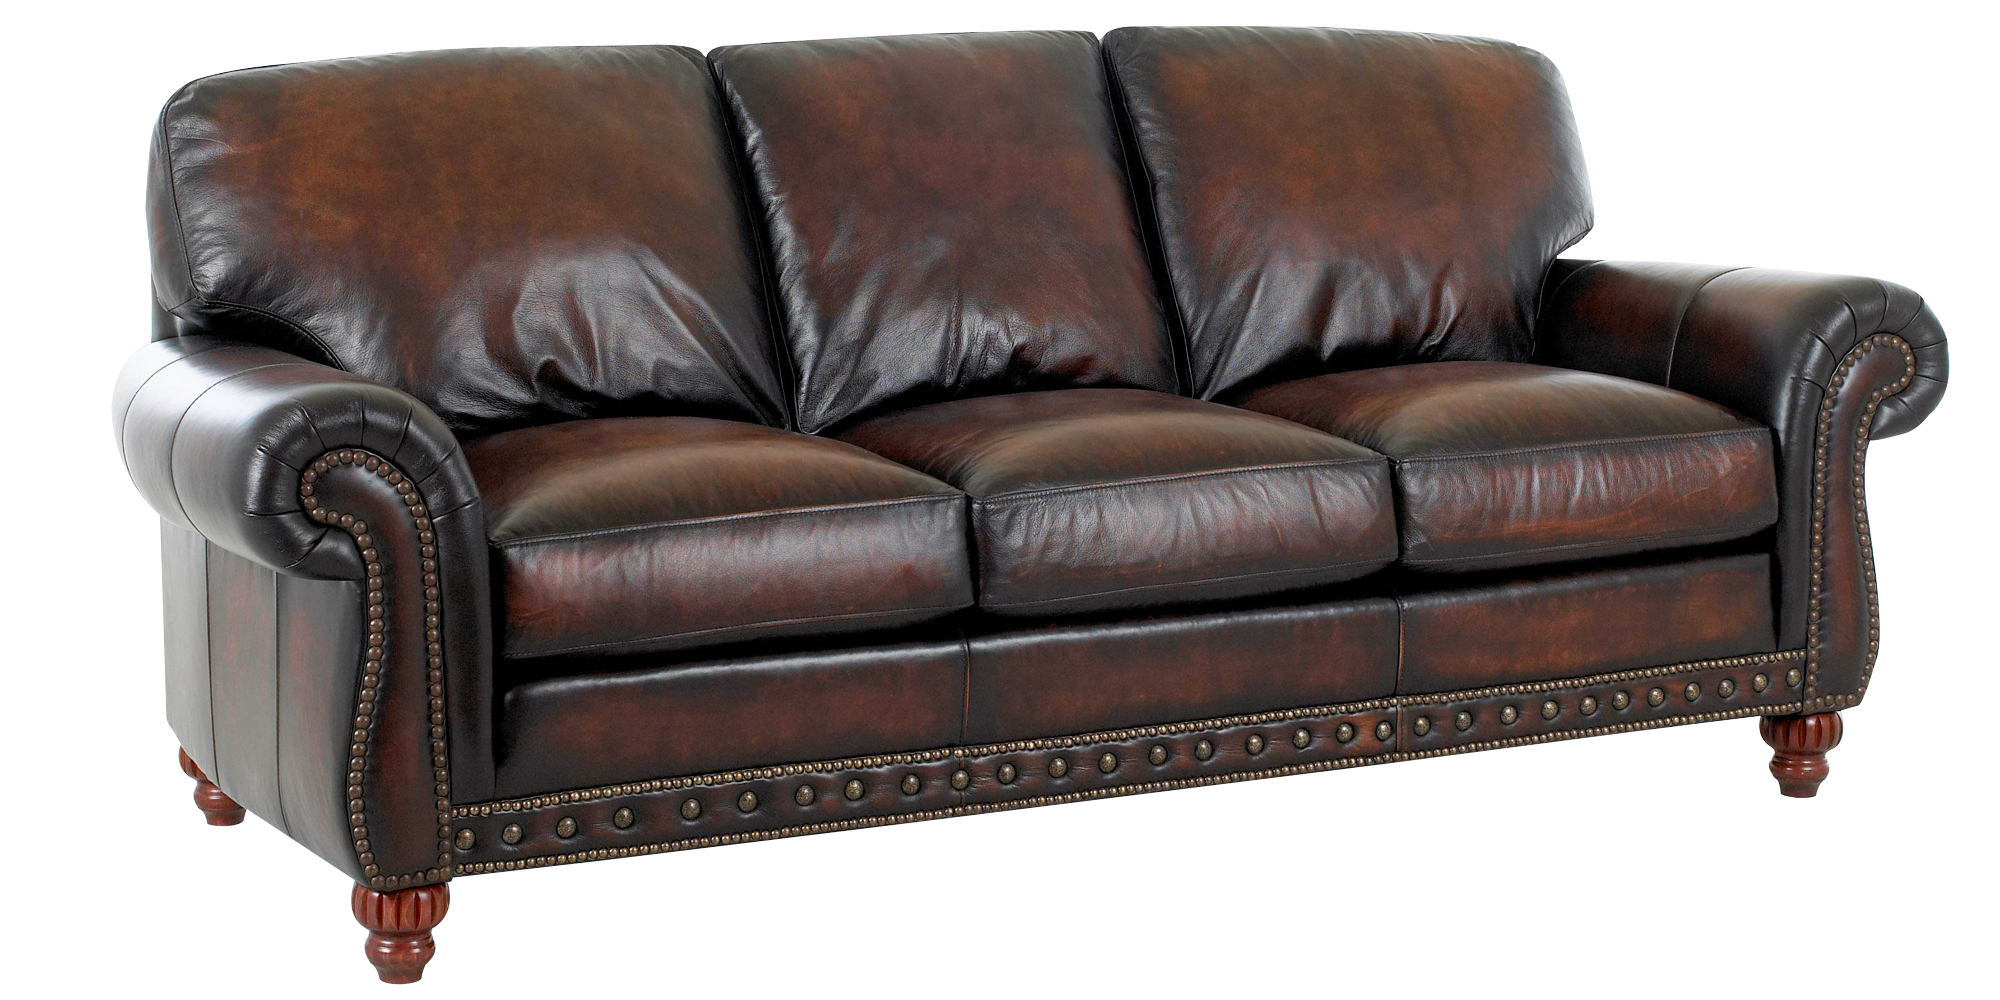 leather furniture gerard old world european collection UWLEOLK